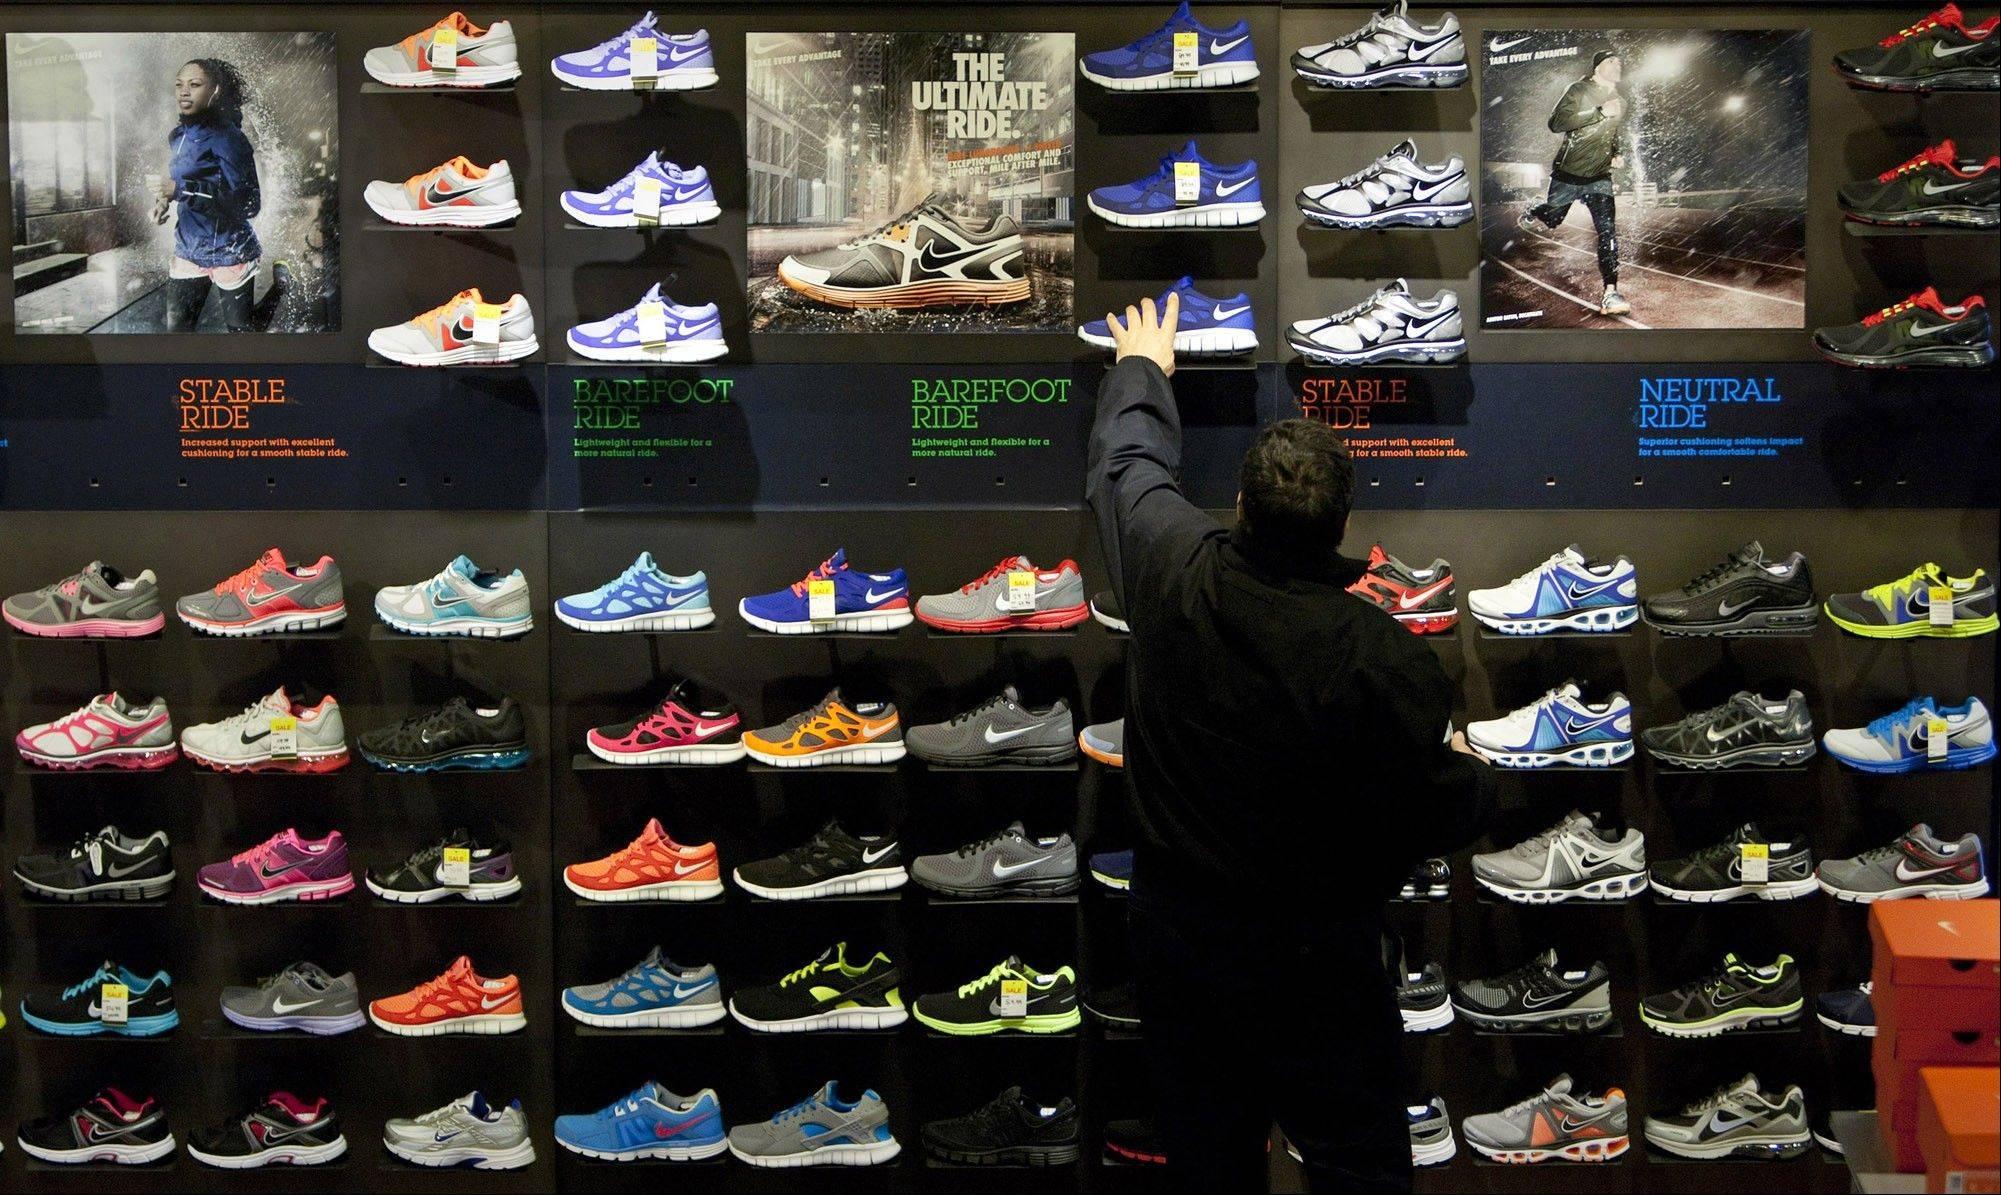 modells nike shoes